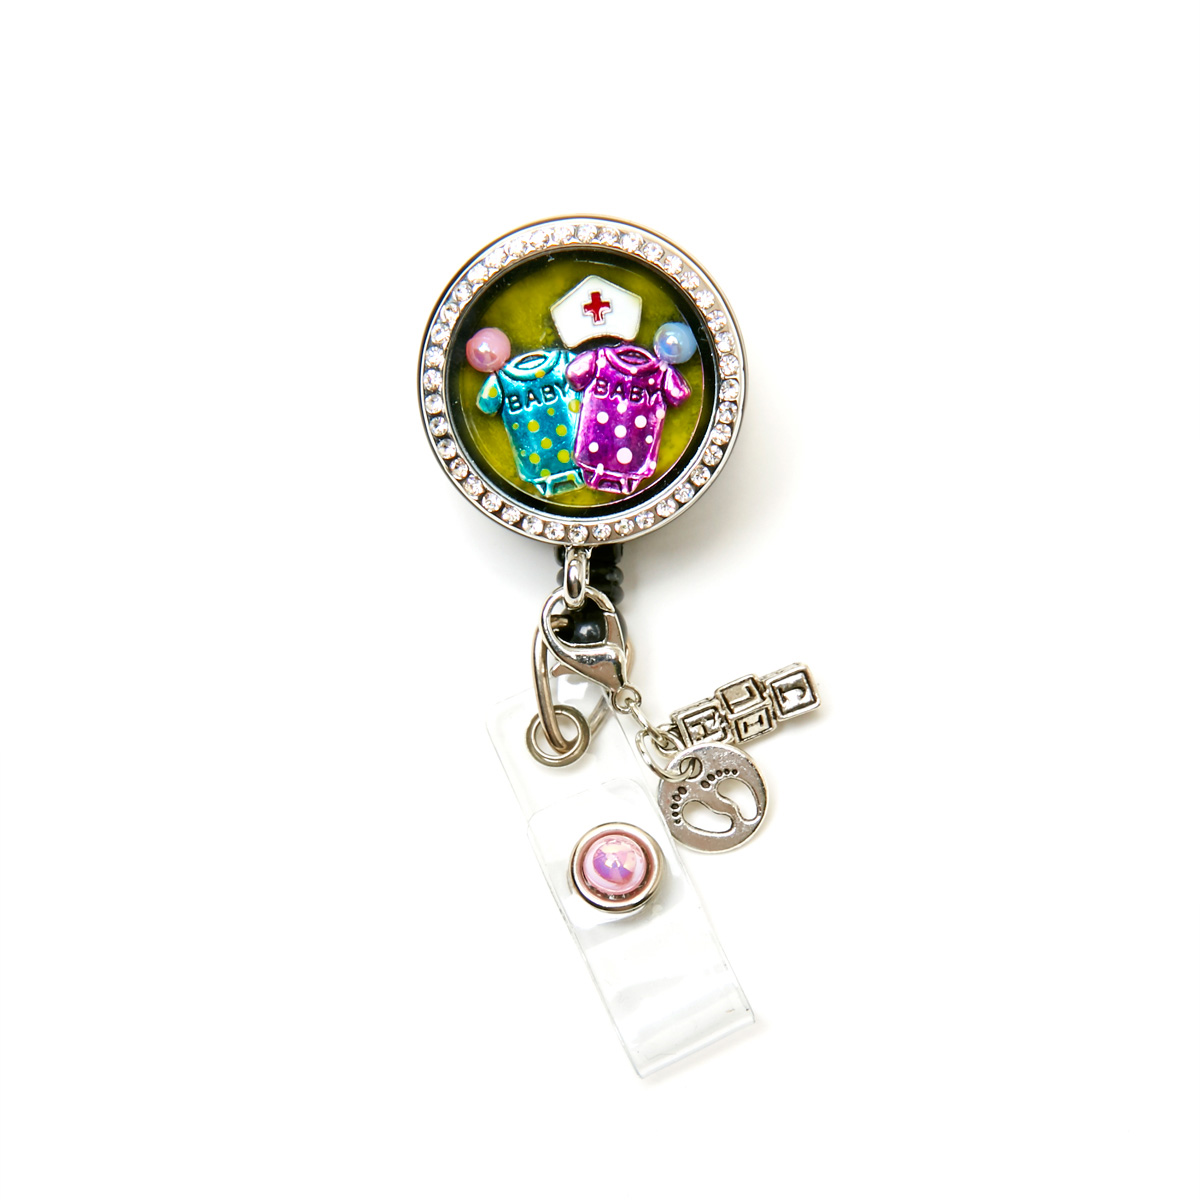 Baby Polka Dot Onesie Charm Locket Retractable Id Badge